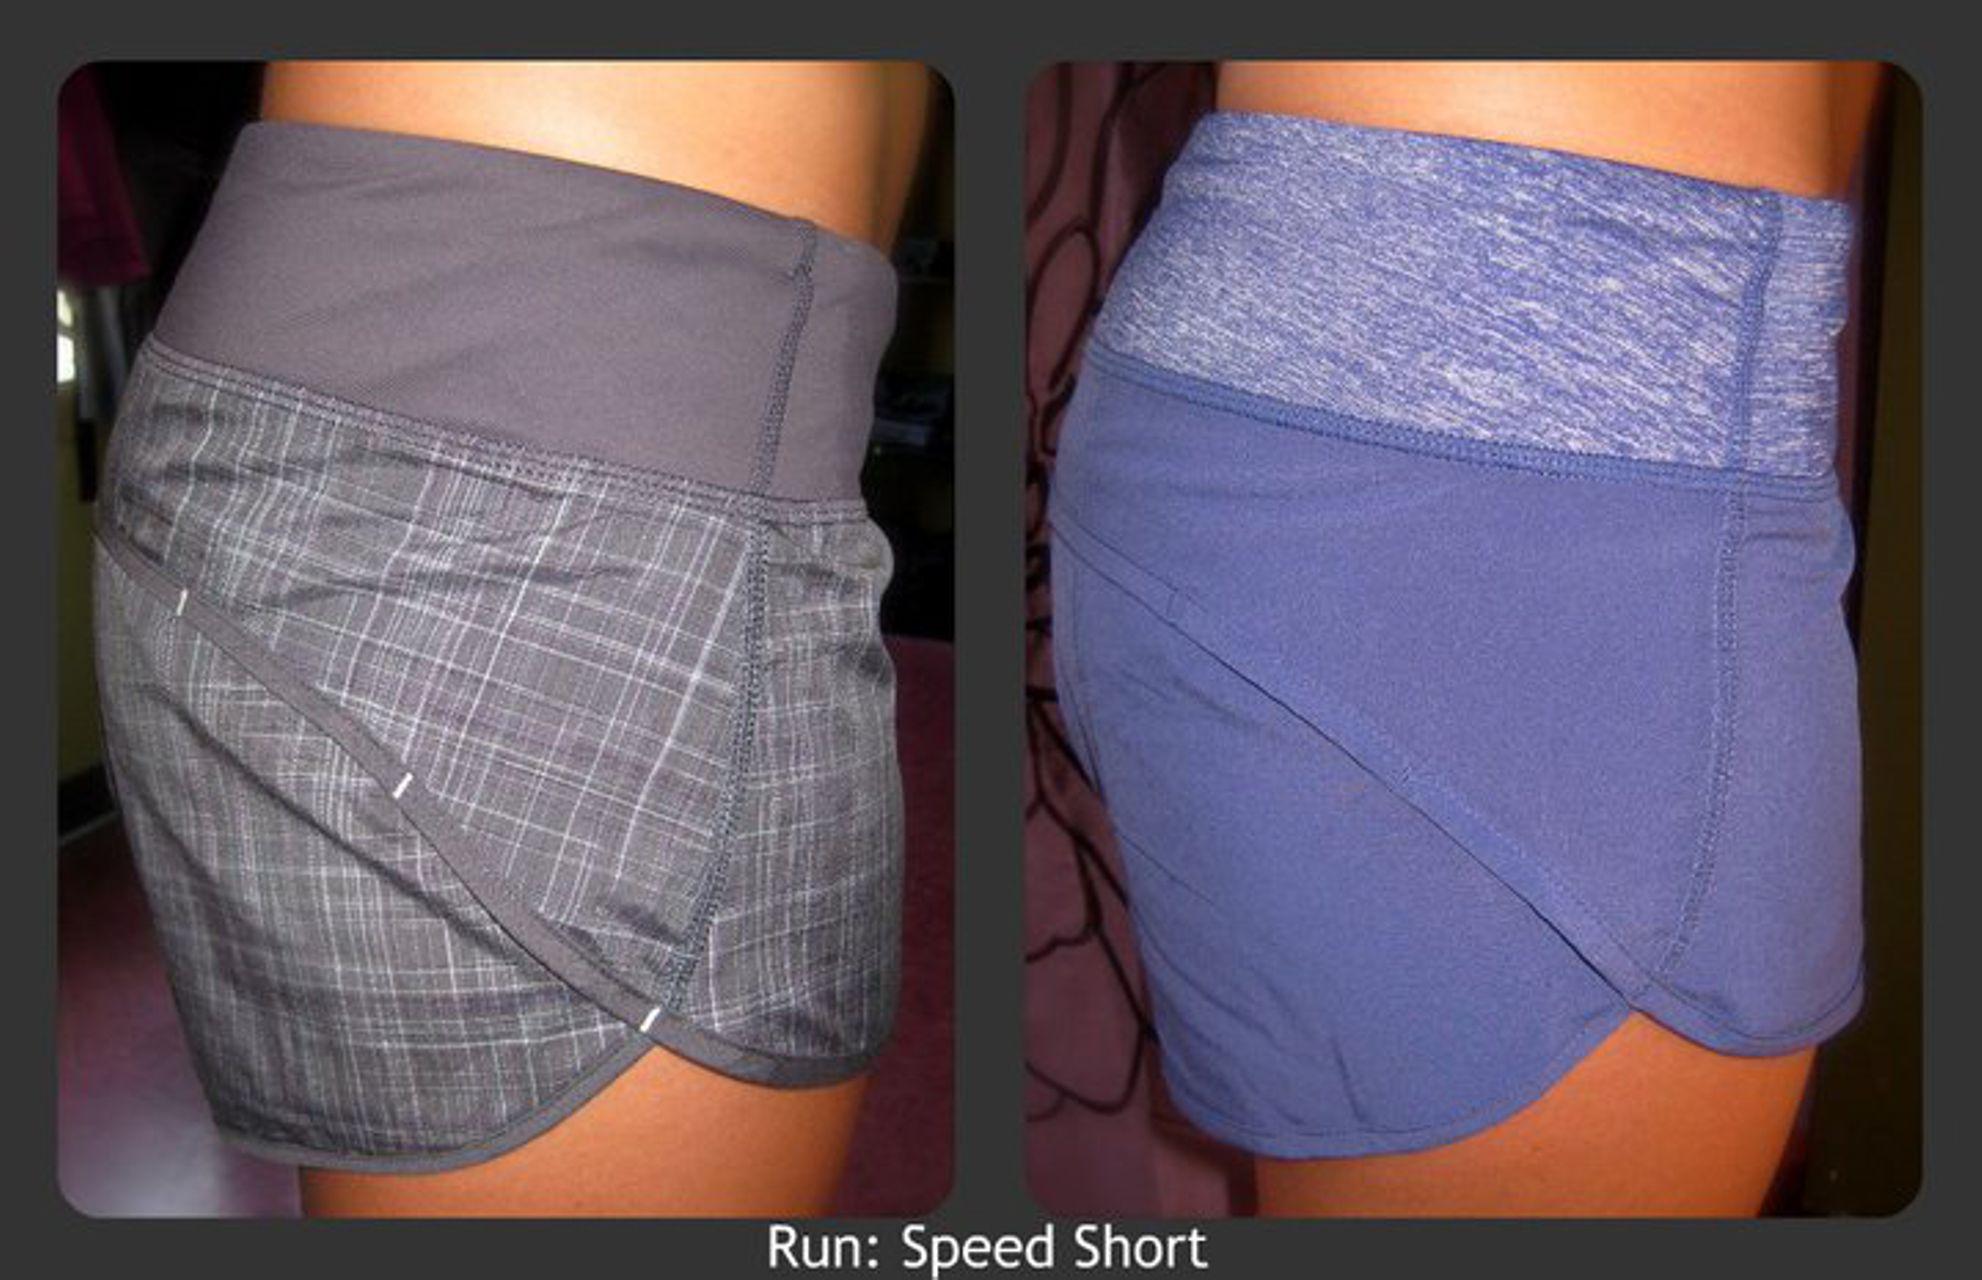 Lululemon Run:  Speed Short - Coal Pig Pink Shale Stripe / Coal / Pig Pink